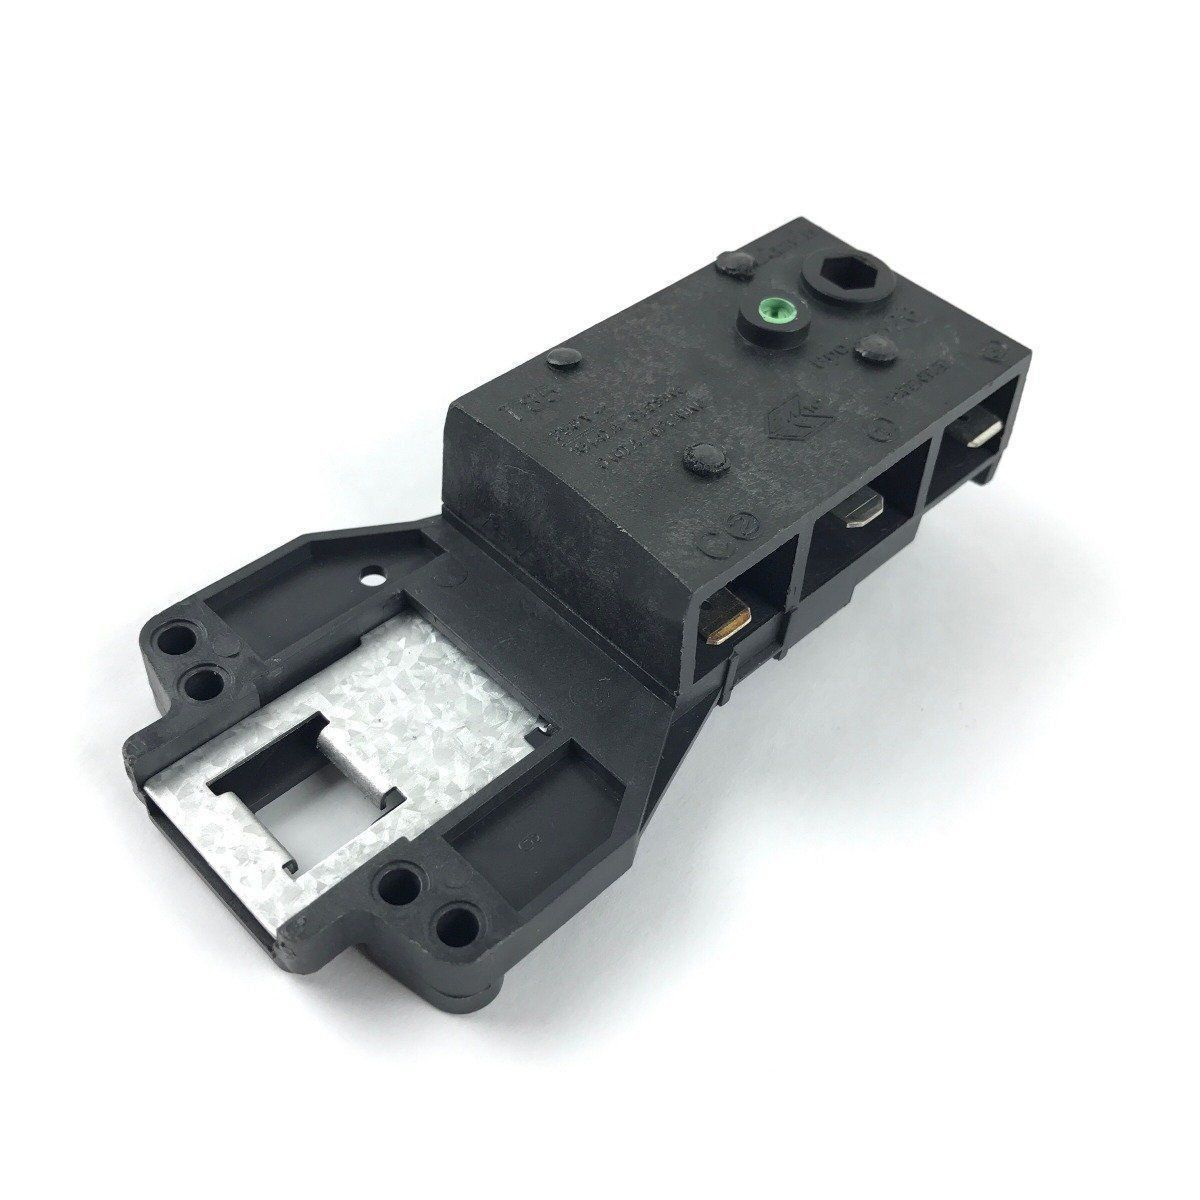 Trava Porta Lavadora Frontal Electrolux LE05 LE10 6440017